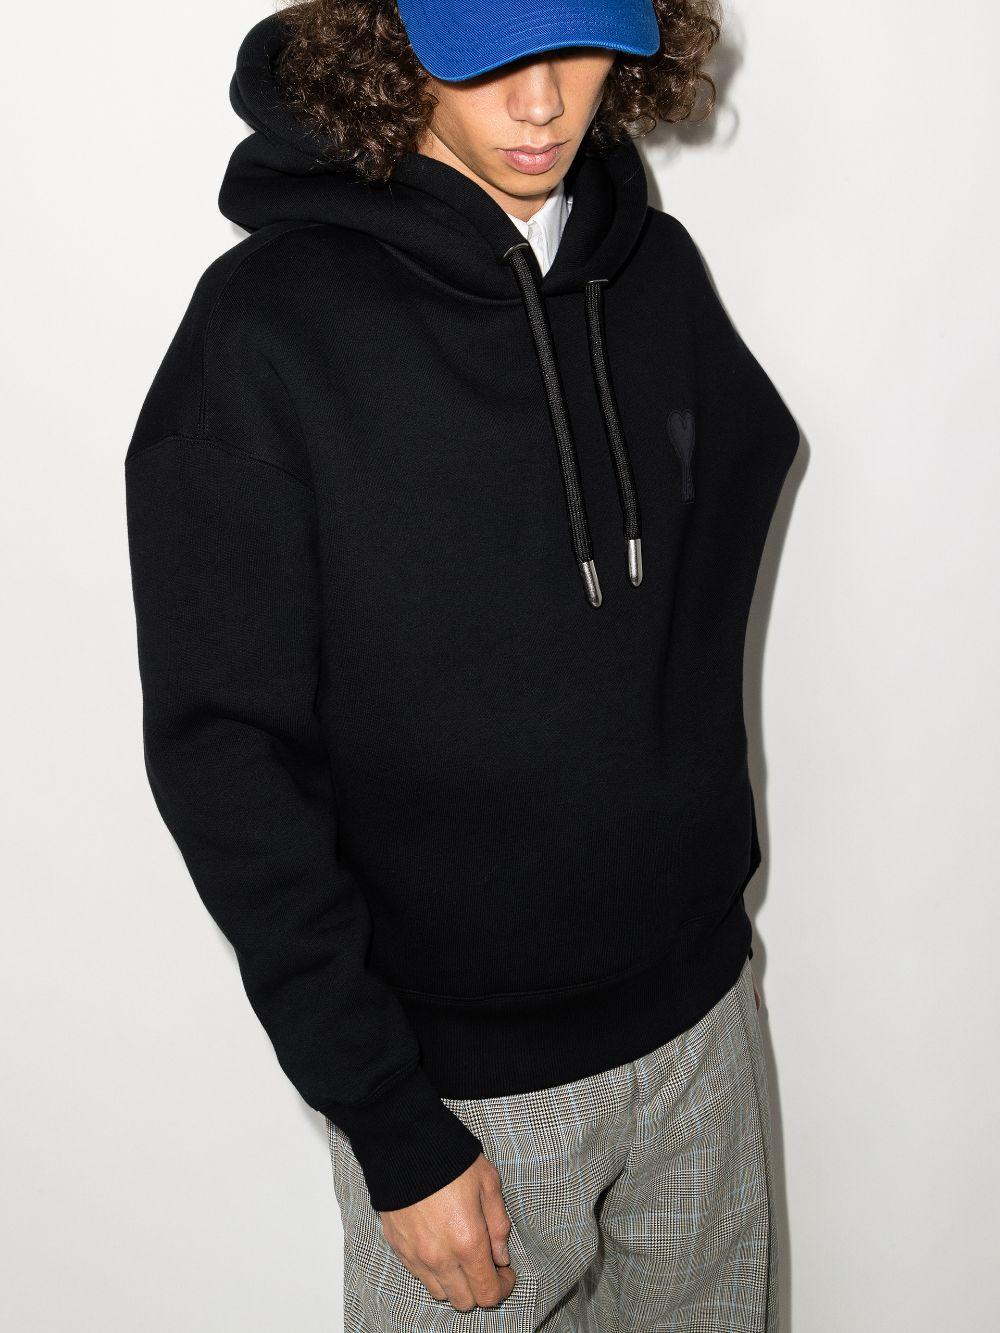 ami coeur tch sweatshirt man black in cotton AMI - ALEXANDRE MATTIUSSI | Sweatshirts | H21HJ067.749001